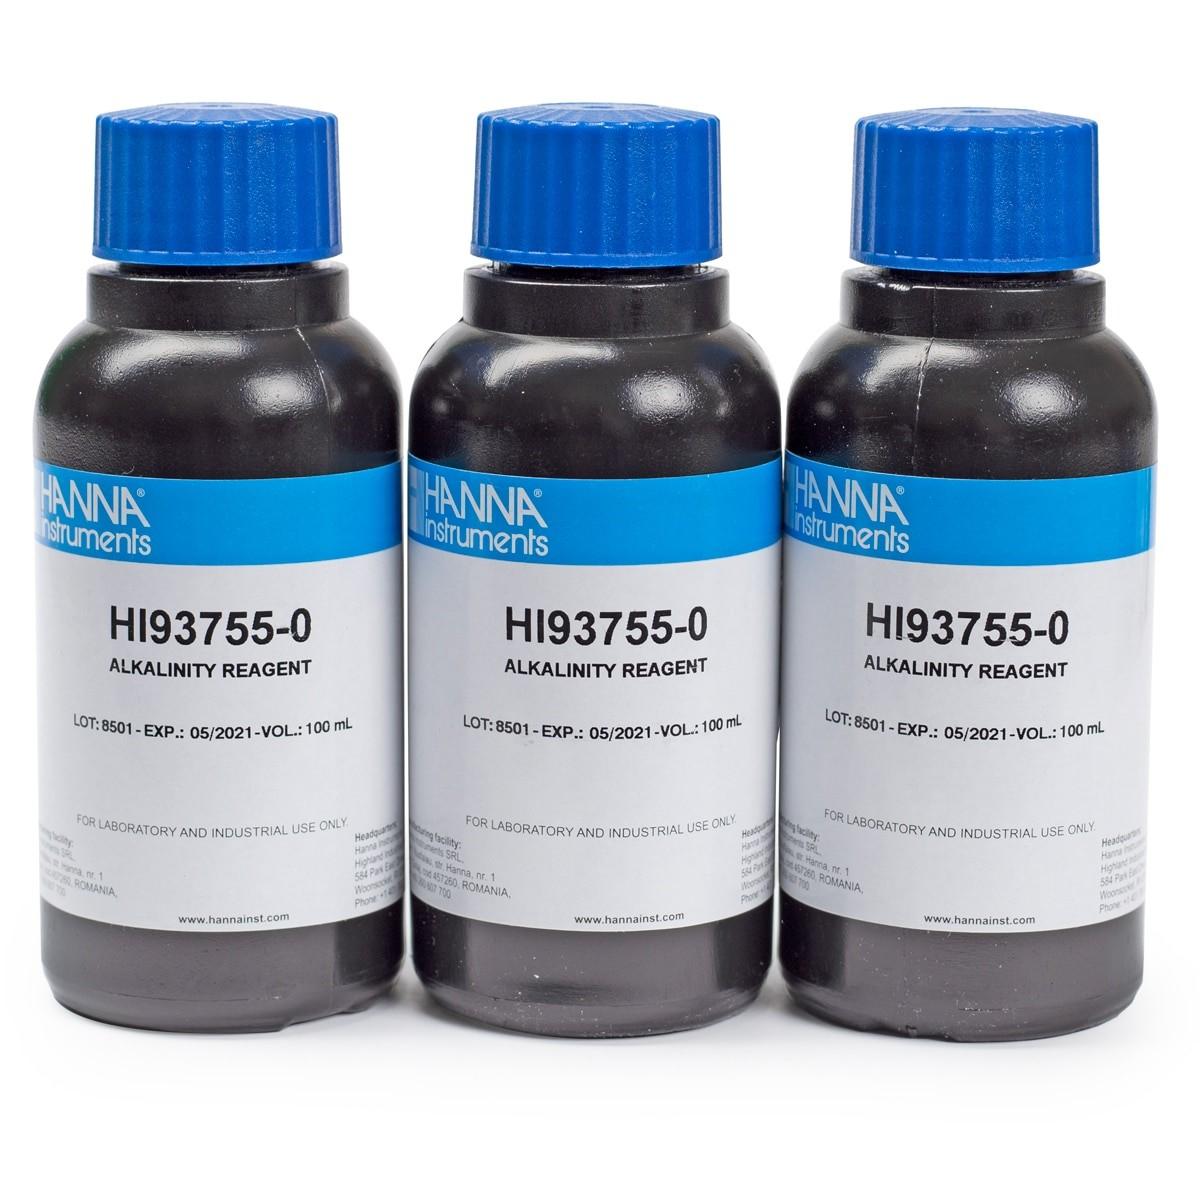 HI93755-03 Alkalinity Reagents (300 tests)